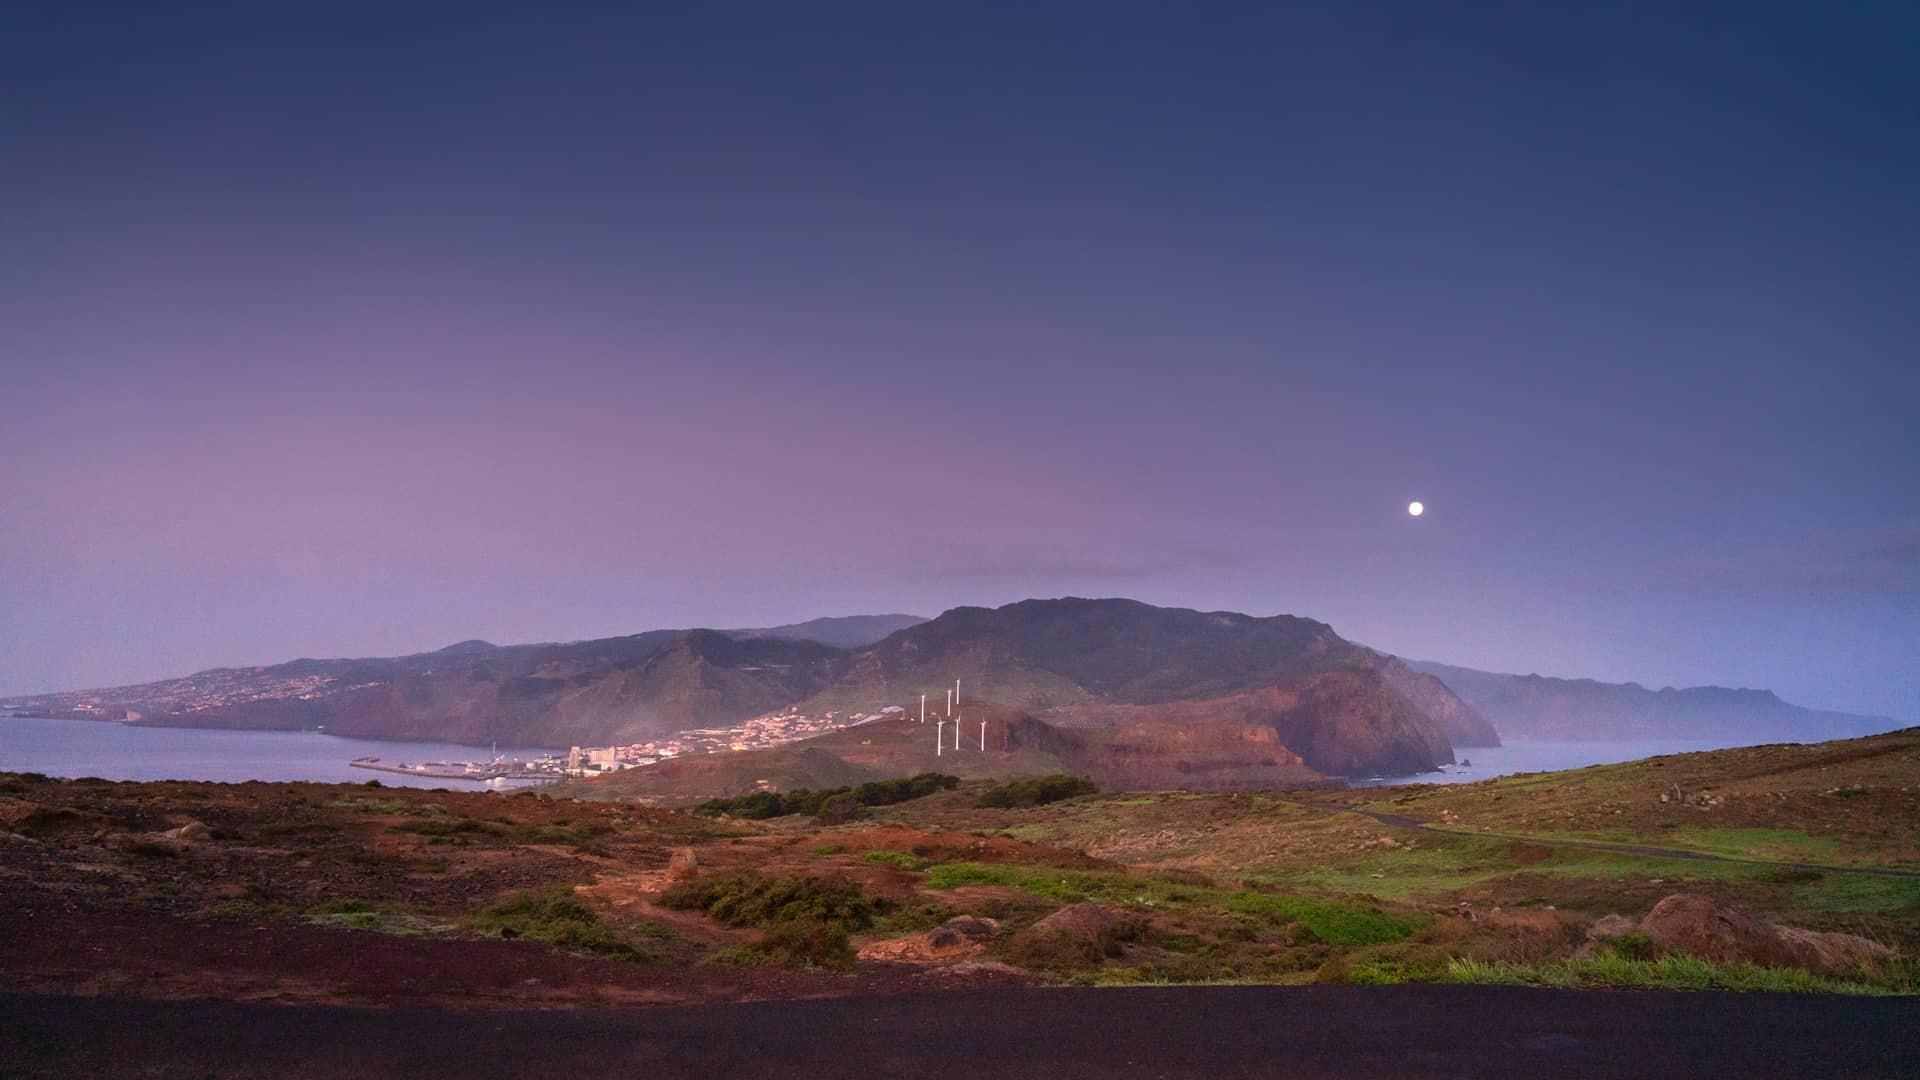 madeira-island-full-moon